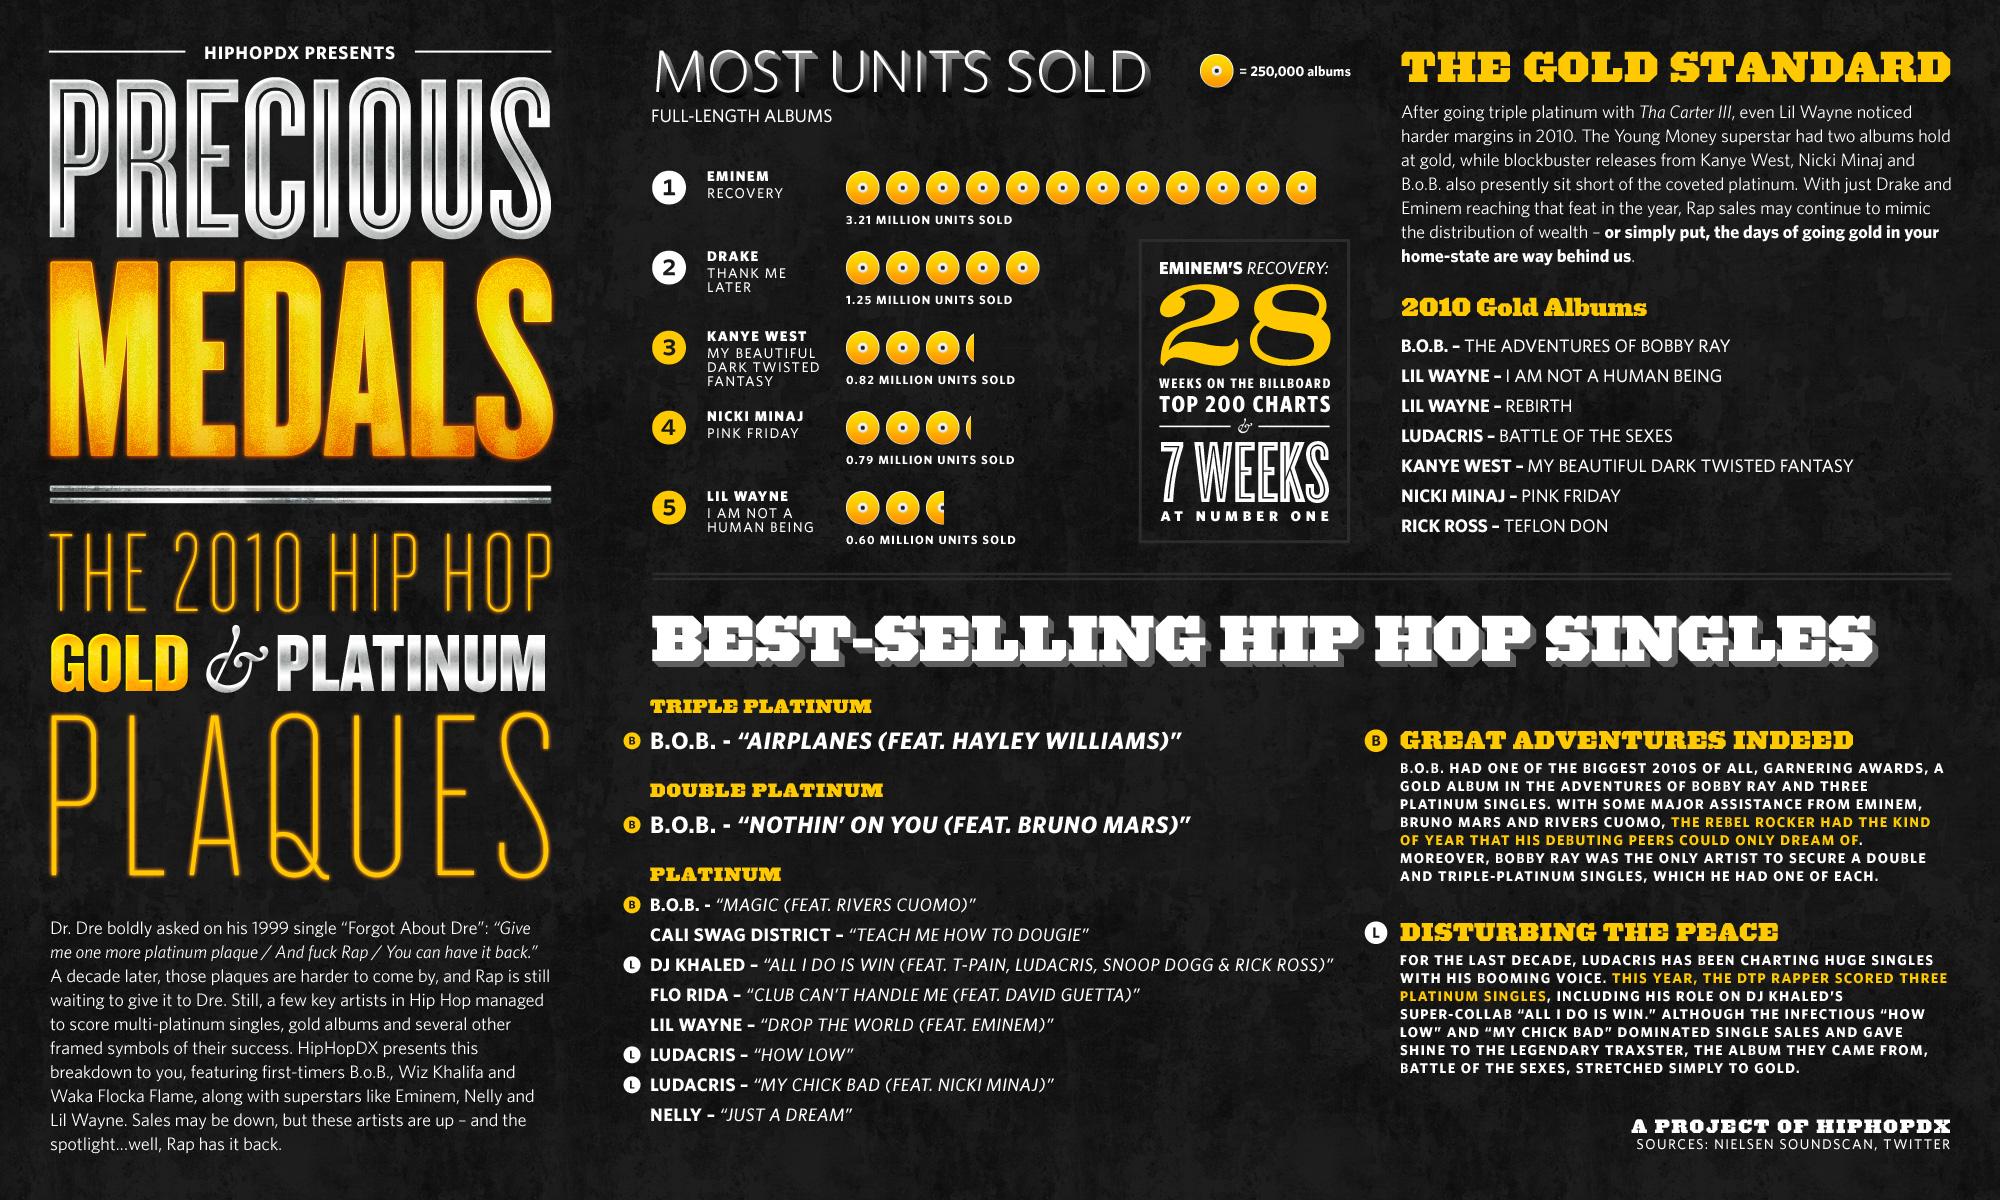 Precious Medals: The 2010 Hip Hop Gold & Platinum Plaques ...